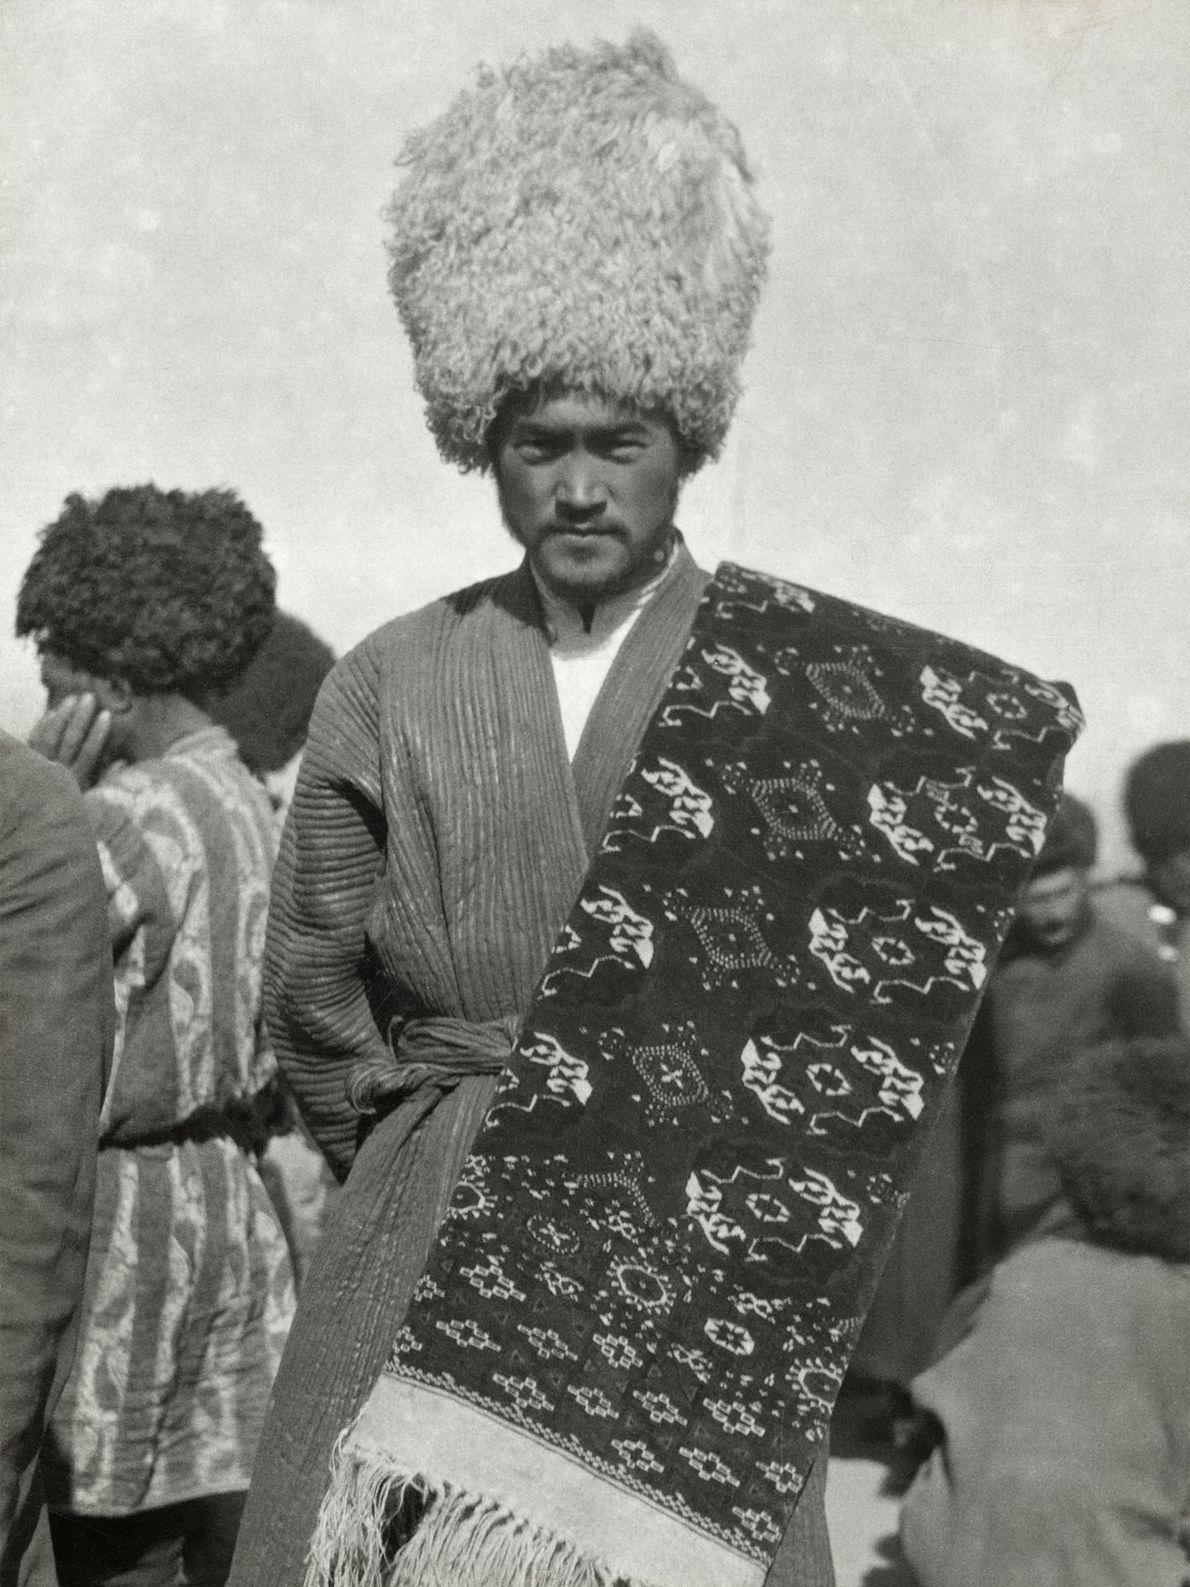 A rug dealer from Turkmenistan in the early 1900s wears a wool telpek hat. The rug ...